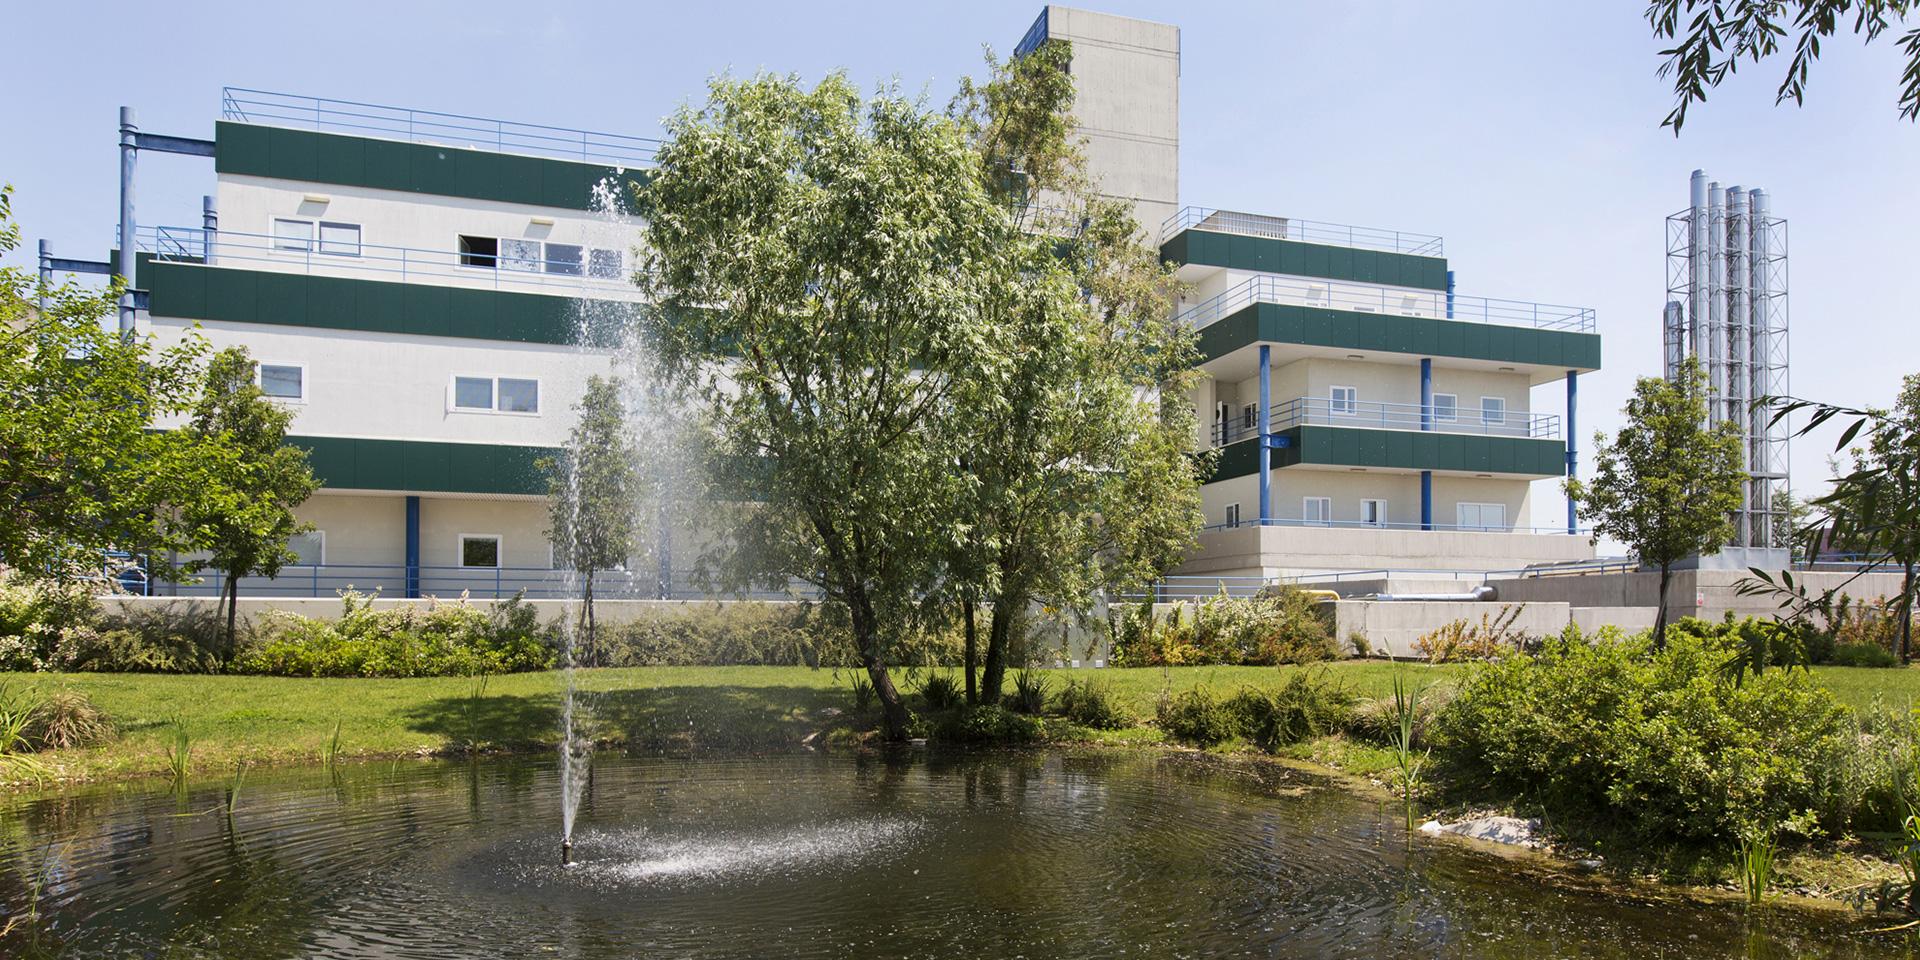 Facoltà di Medicina-Chirurgia e Scienze MM.FF.N. a Pavia, Binini Partners, Società di architettura e ingegneria